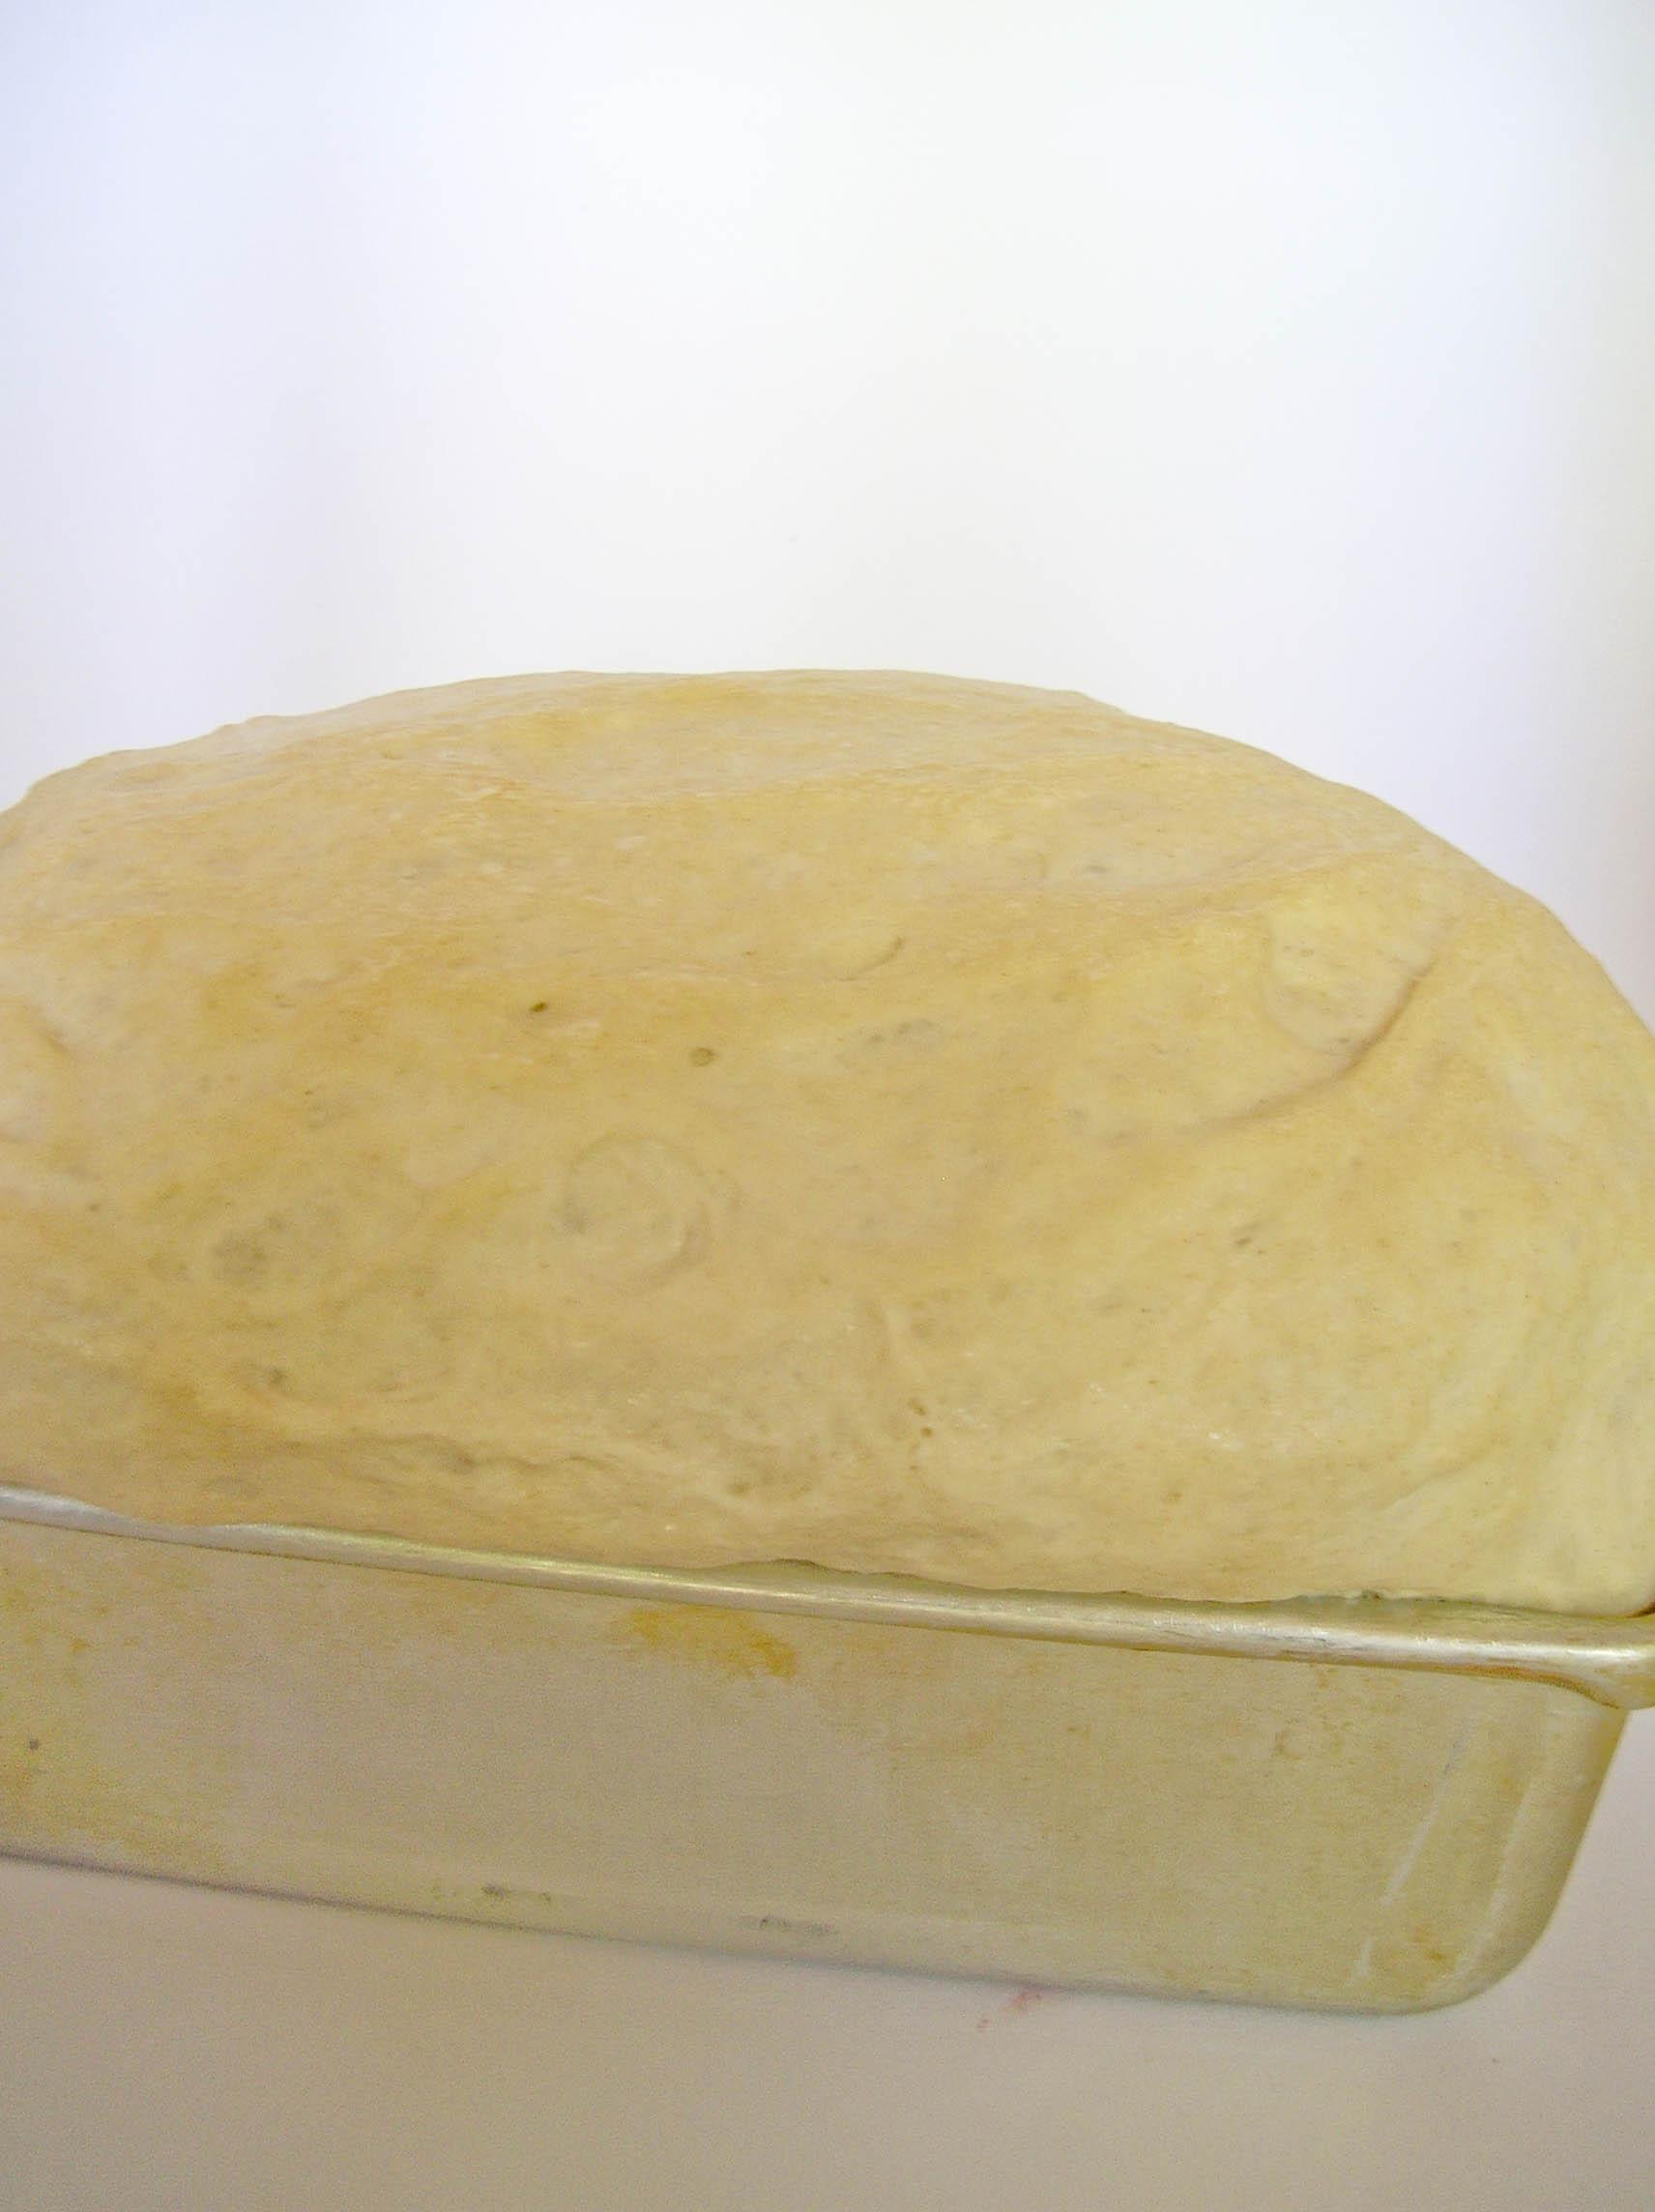 bake1